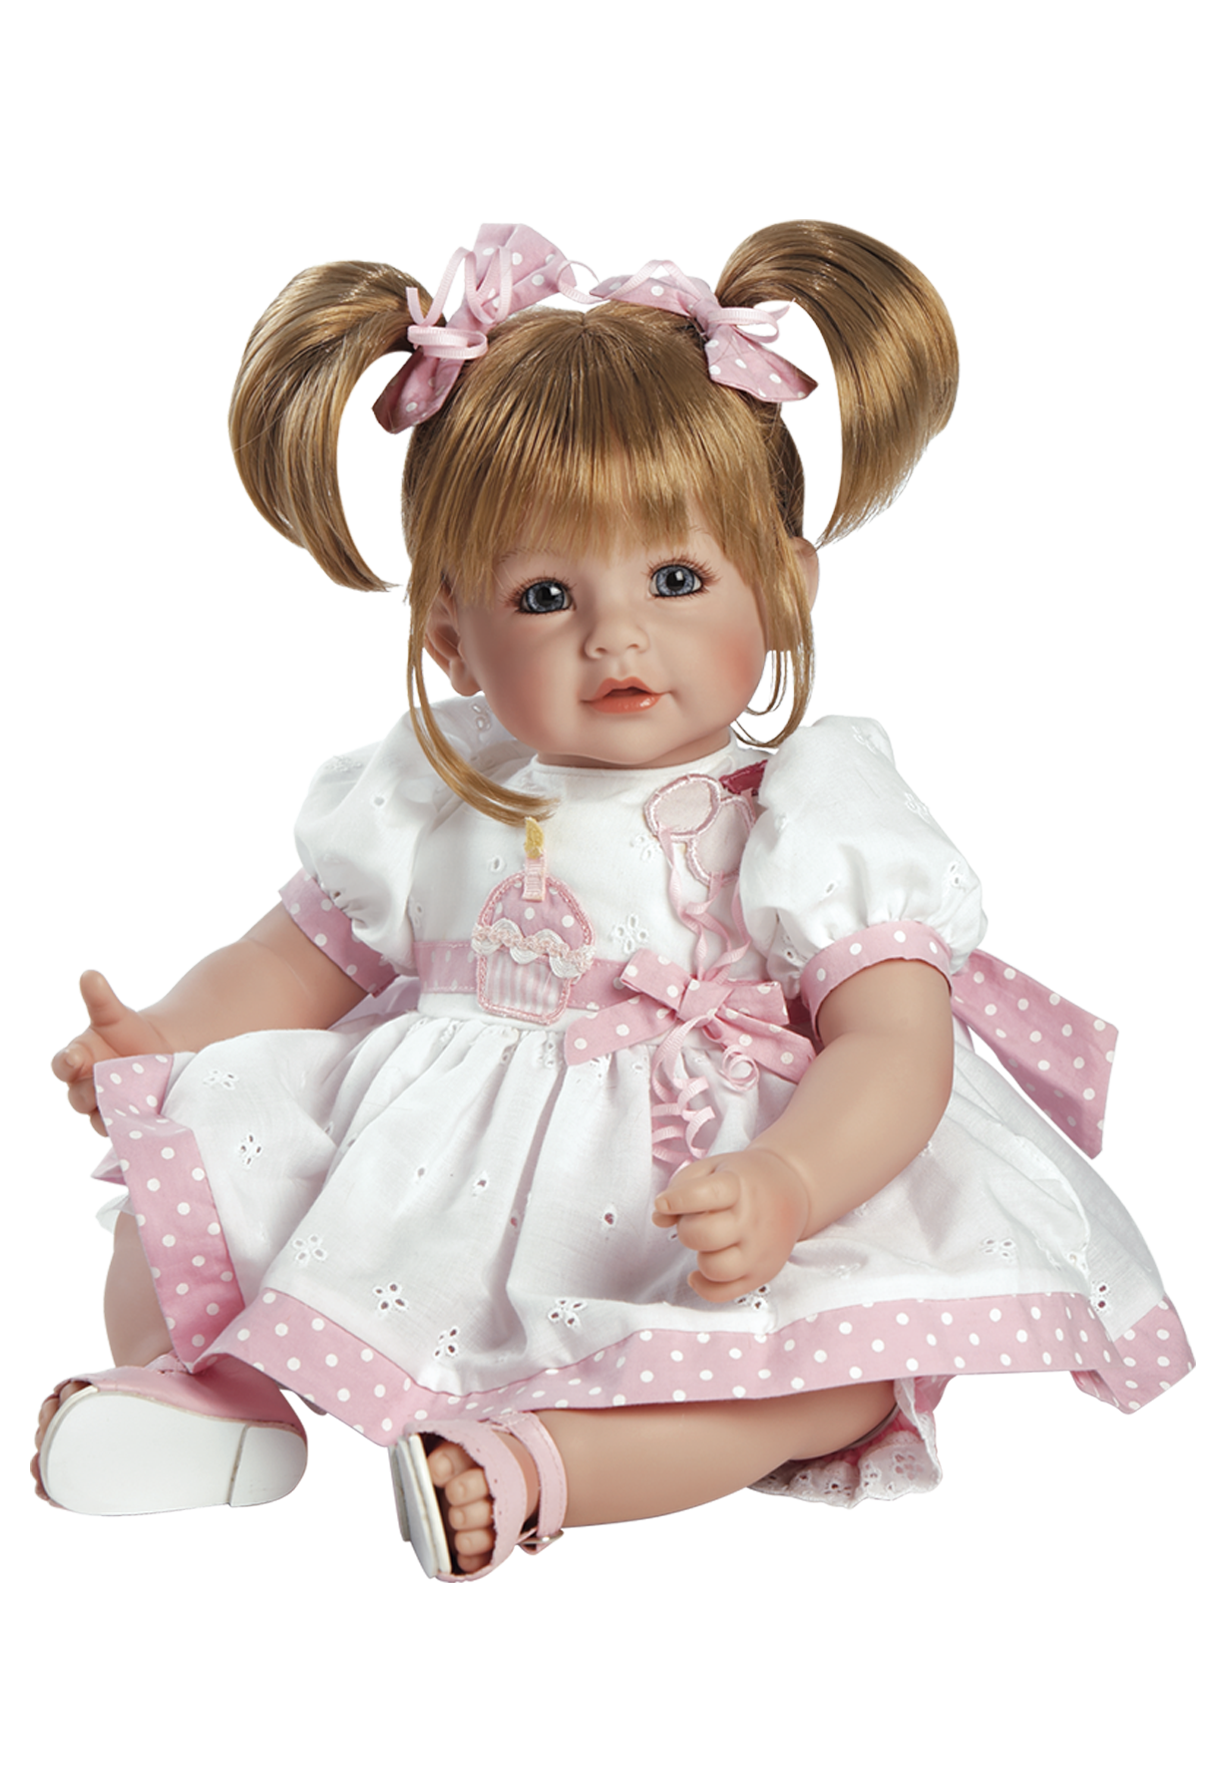 Happy Birthday, Baby Real looking baby dolls, Baby dolls